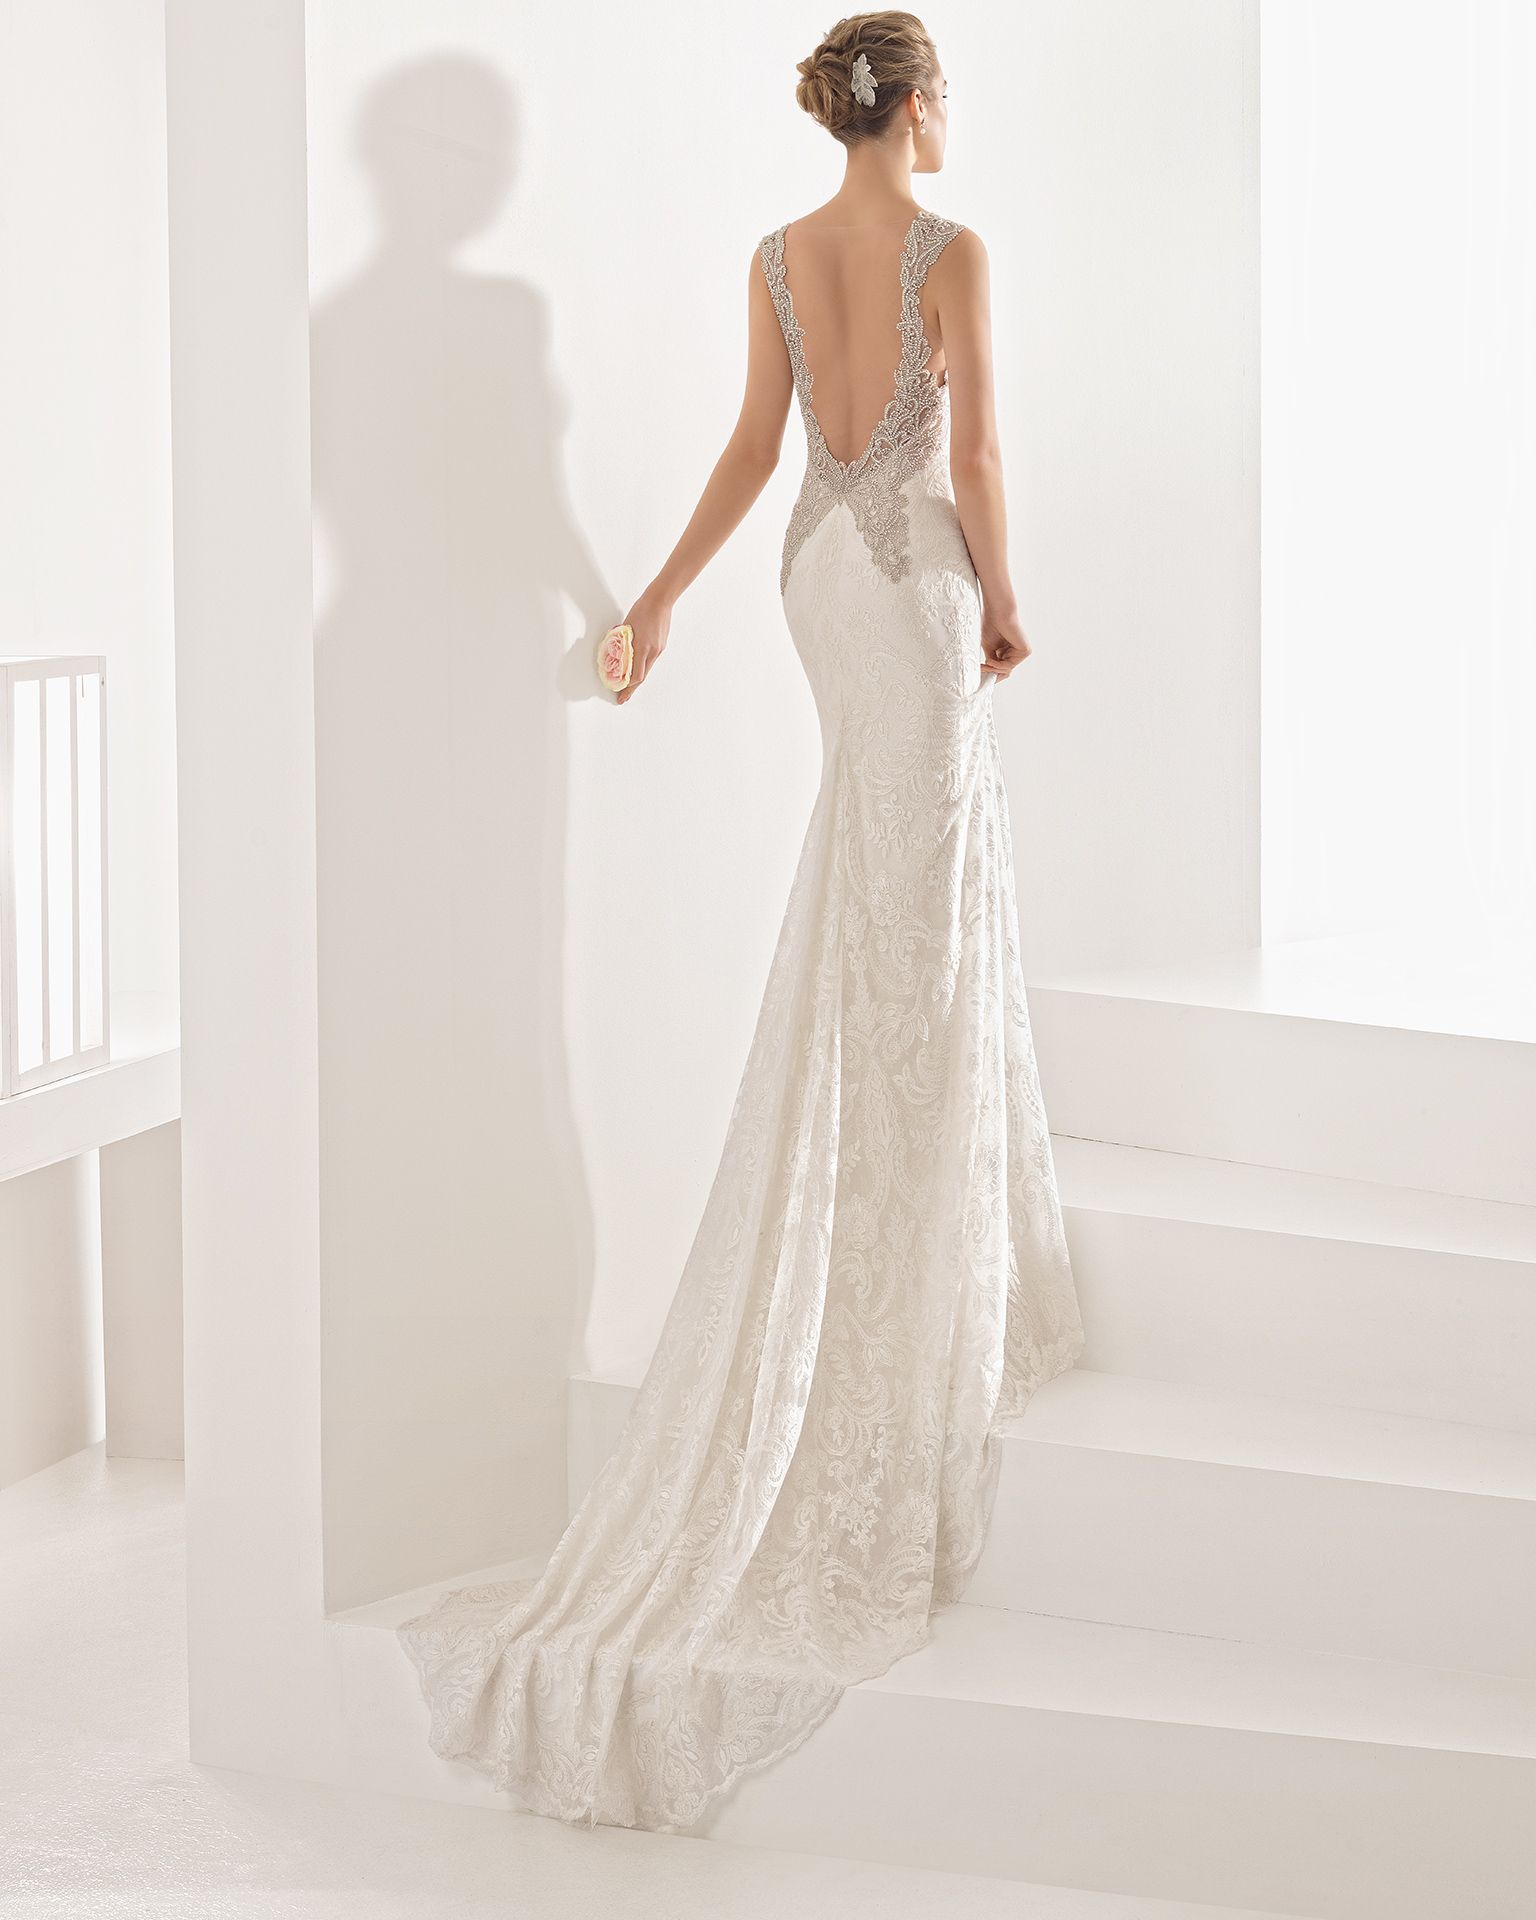 Nagore - 2017 Bridal Collection. Rosa Clará.   Rückenfrei, Braut und ...